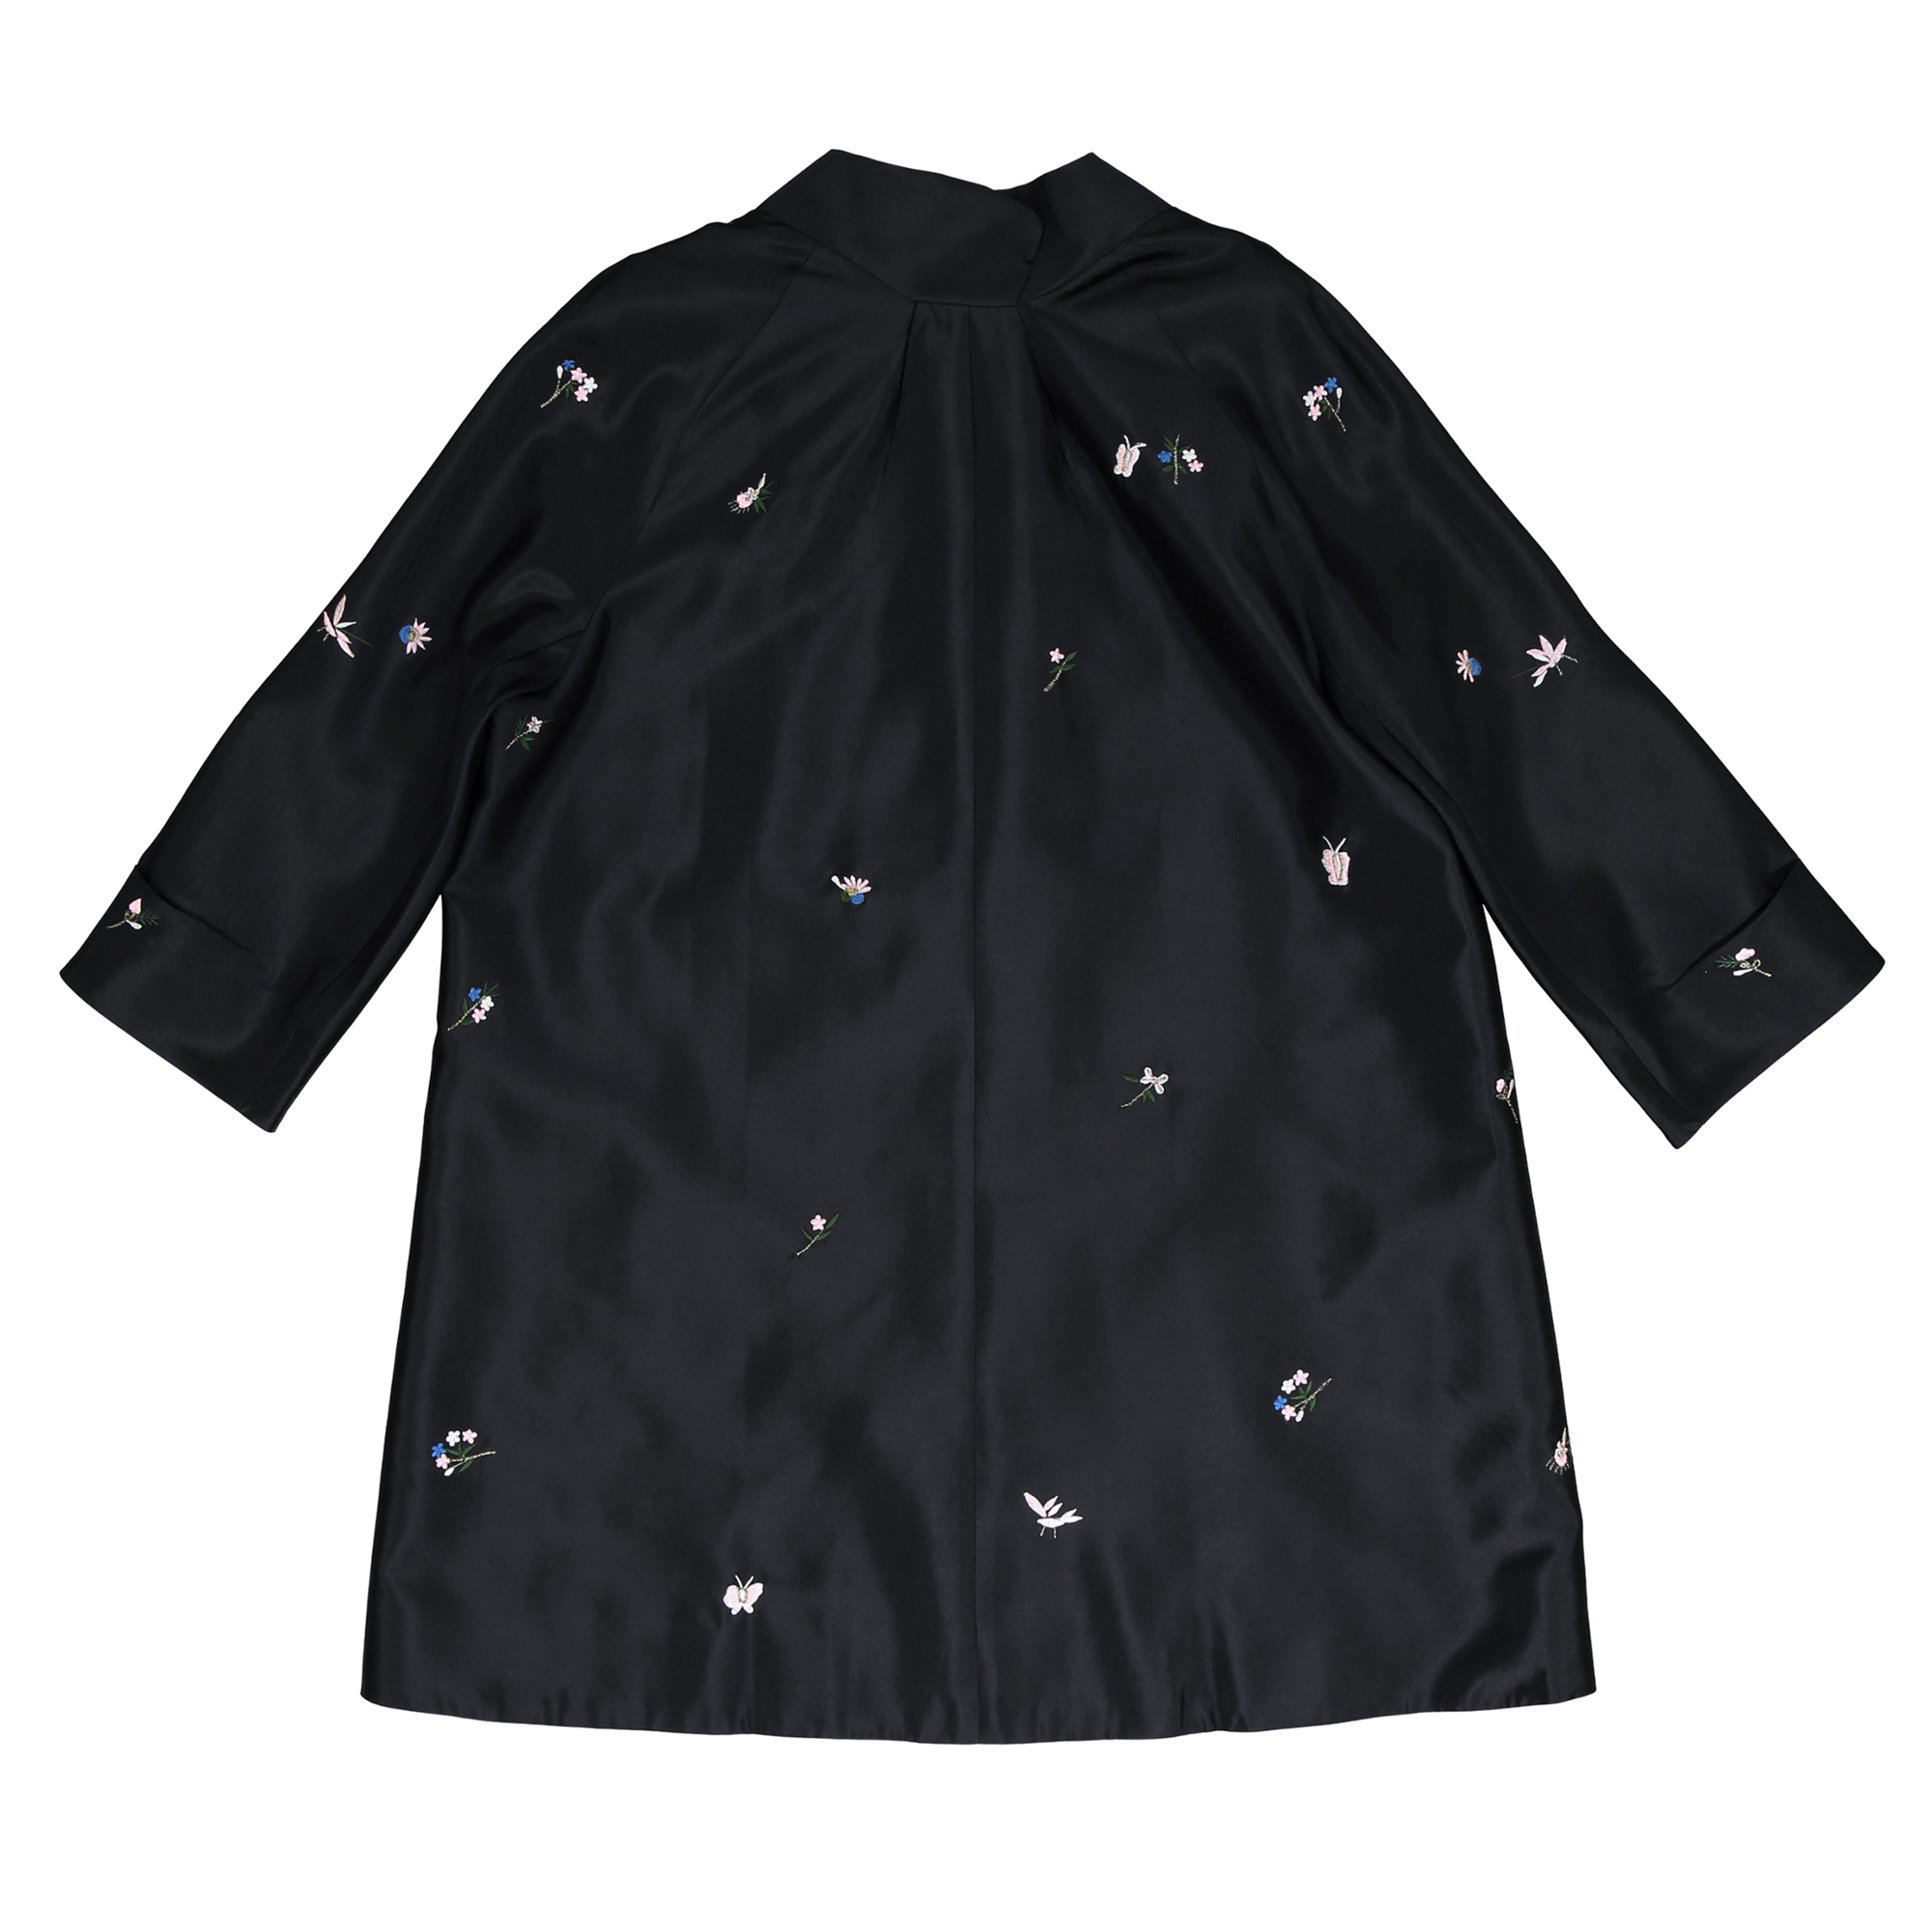 Silk+Jacket,+Black+(2.800+DKK)_3.jpg